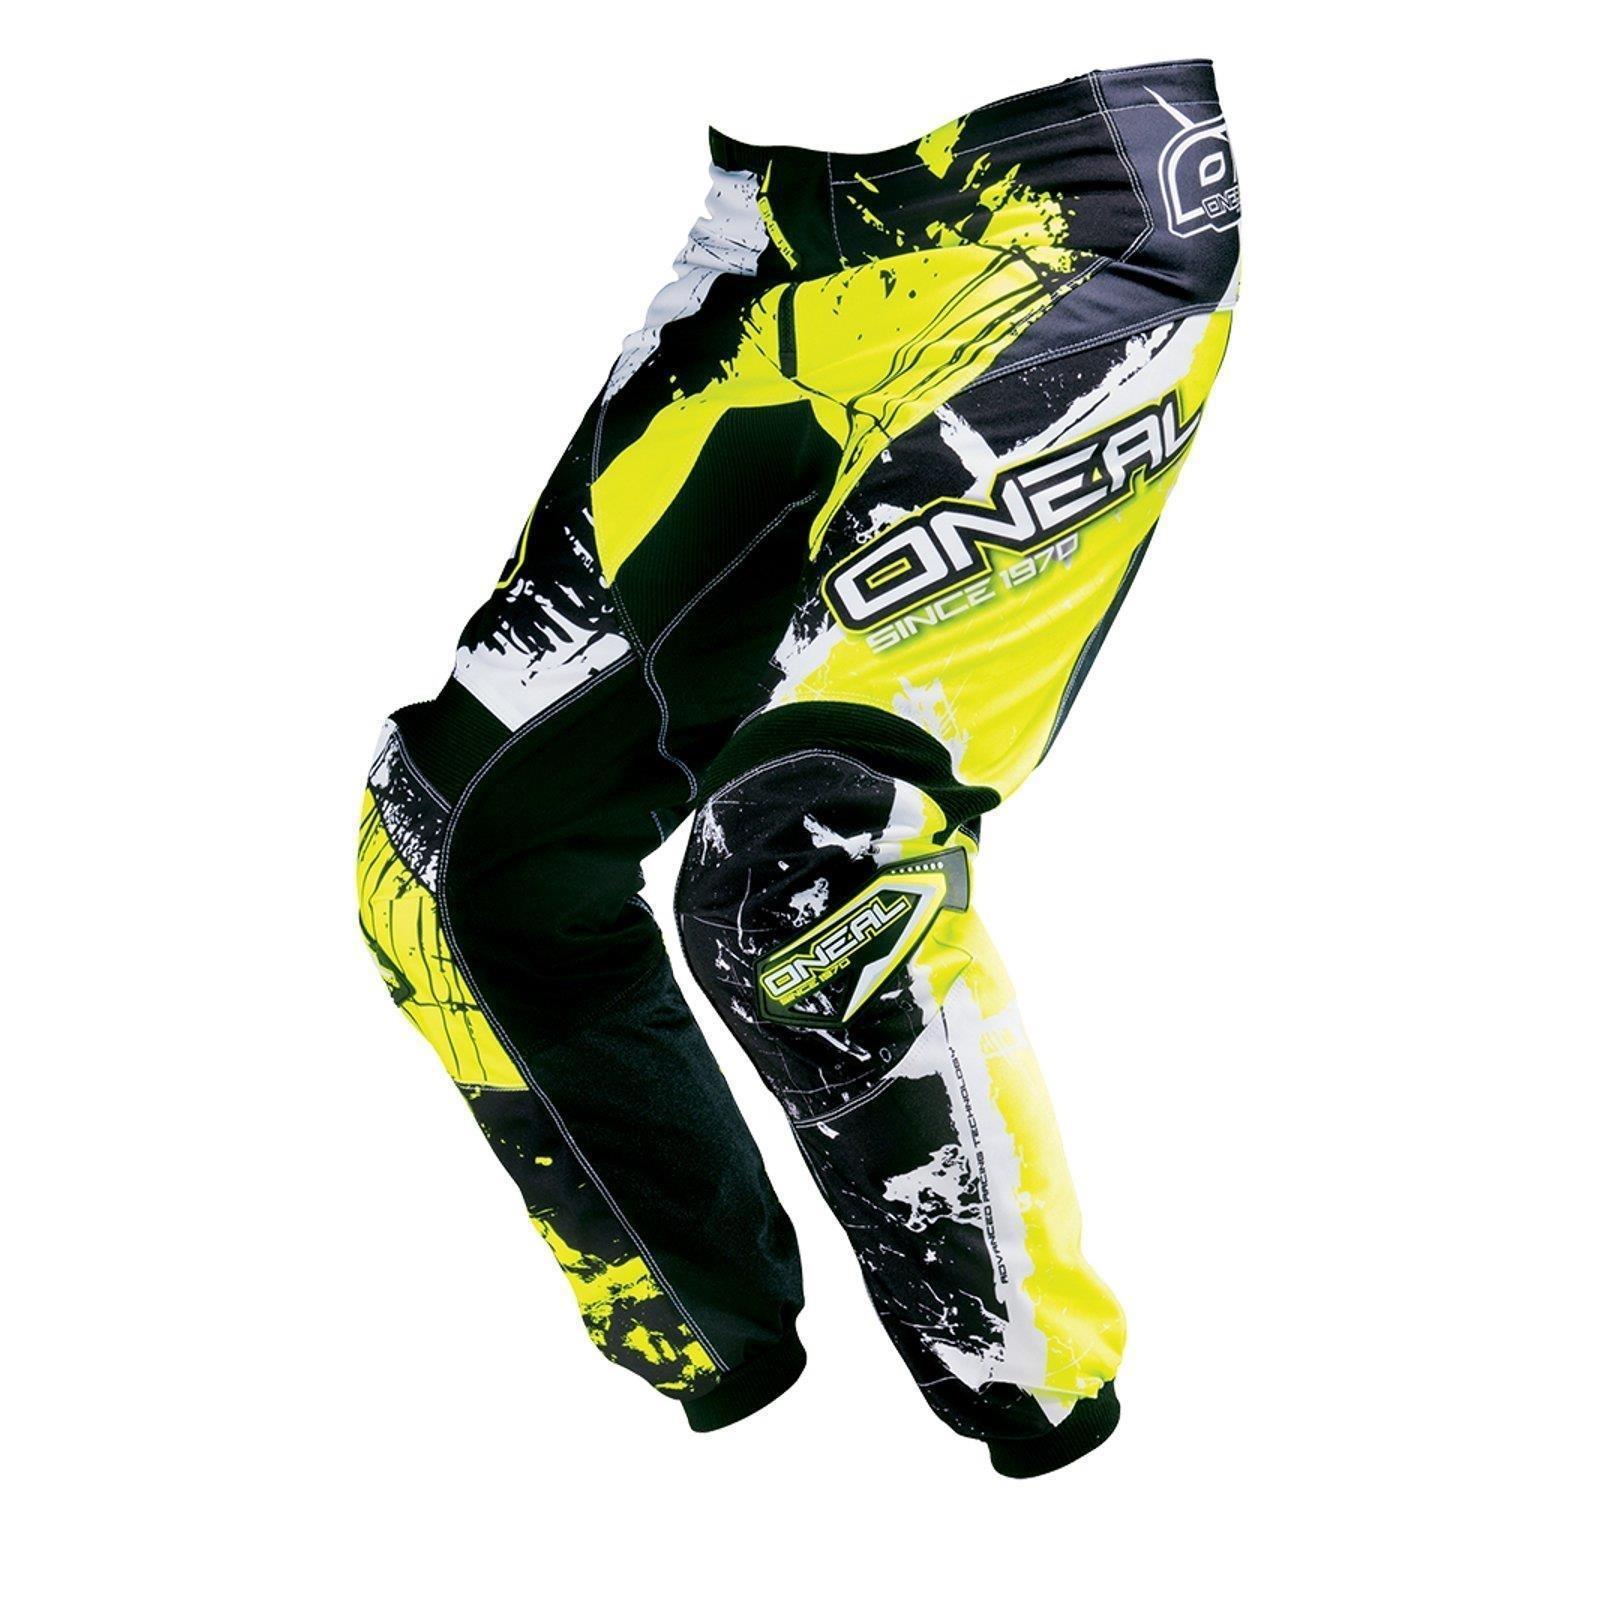 Oneal-elemento-ninos-MX-Jersey-pantalones-Shocker-Moto-Cross-Enduro-Mountainbike-MTB miniatura 16